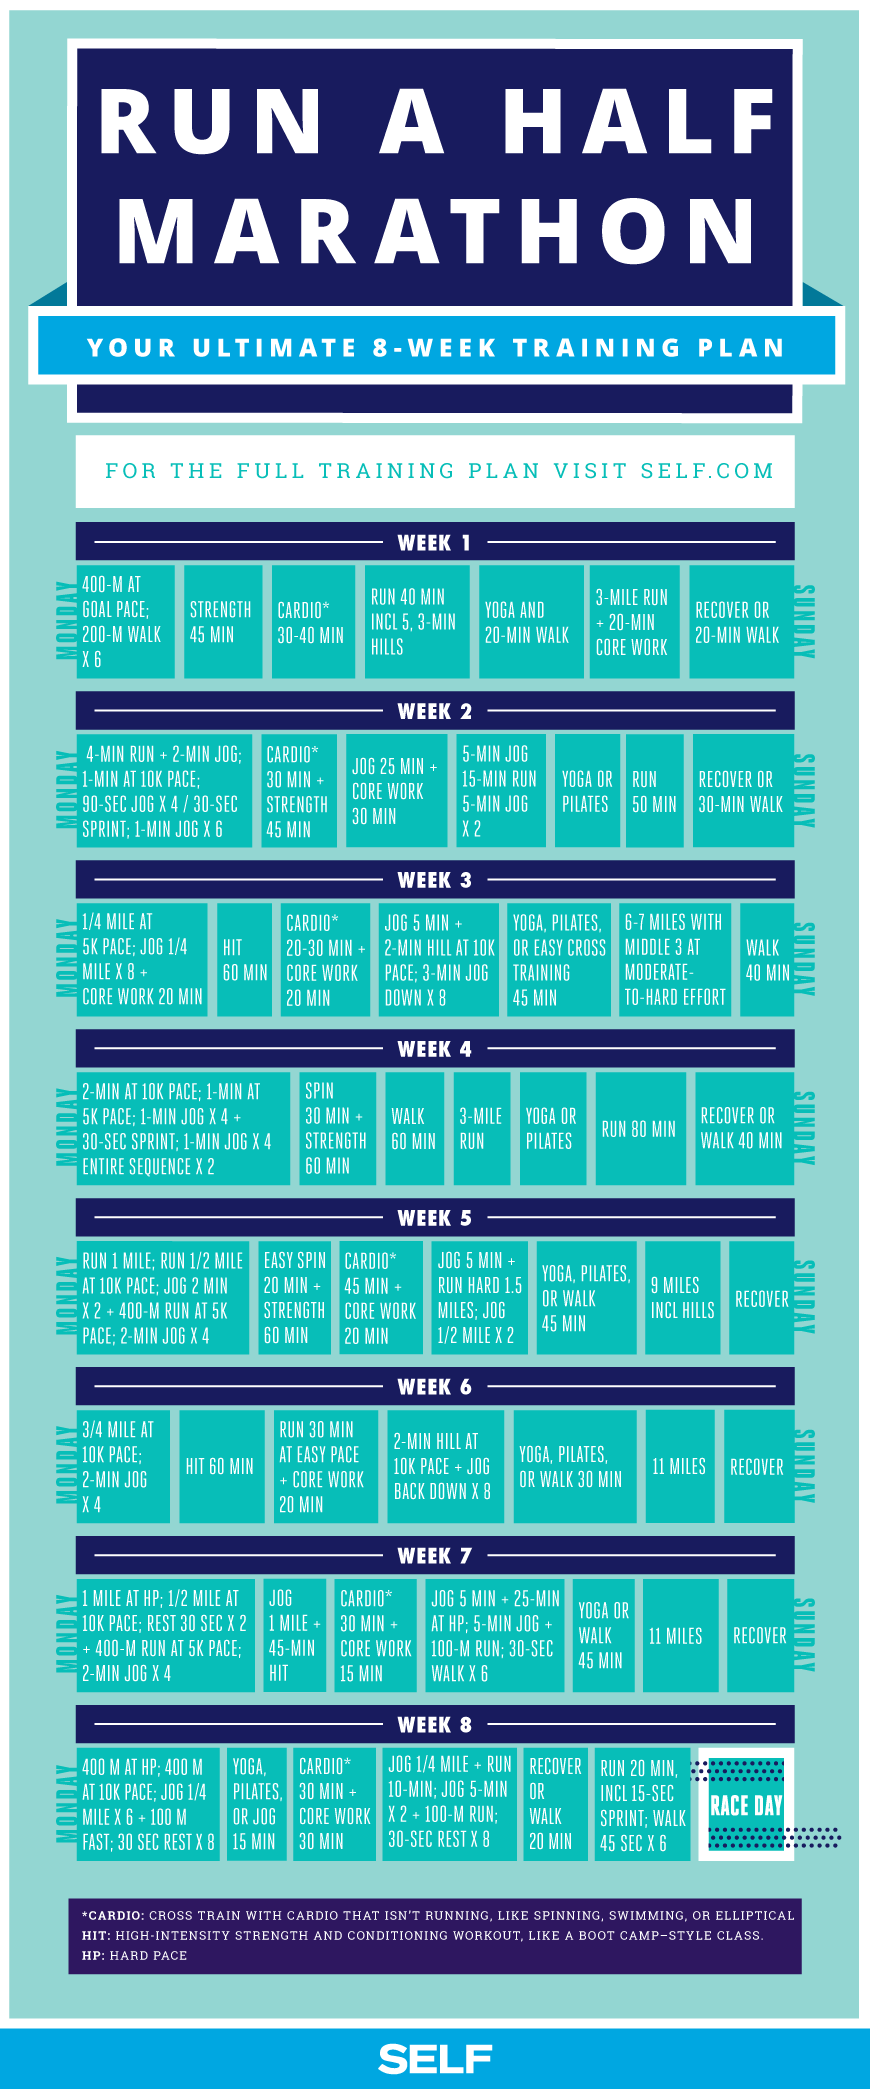 Run A Half Marathon: The Ultimate 8-Week Training Plan